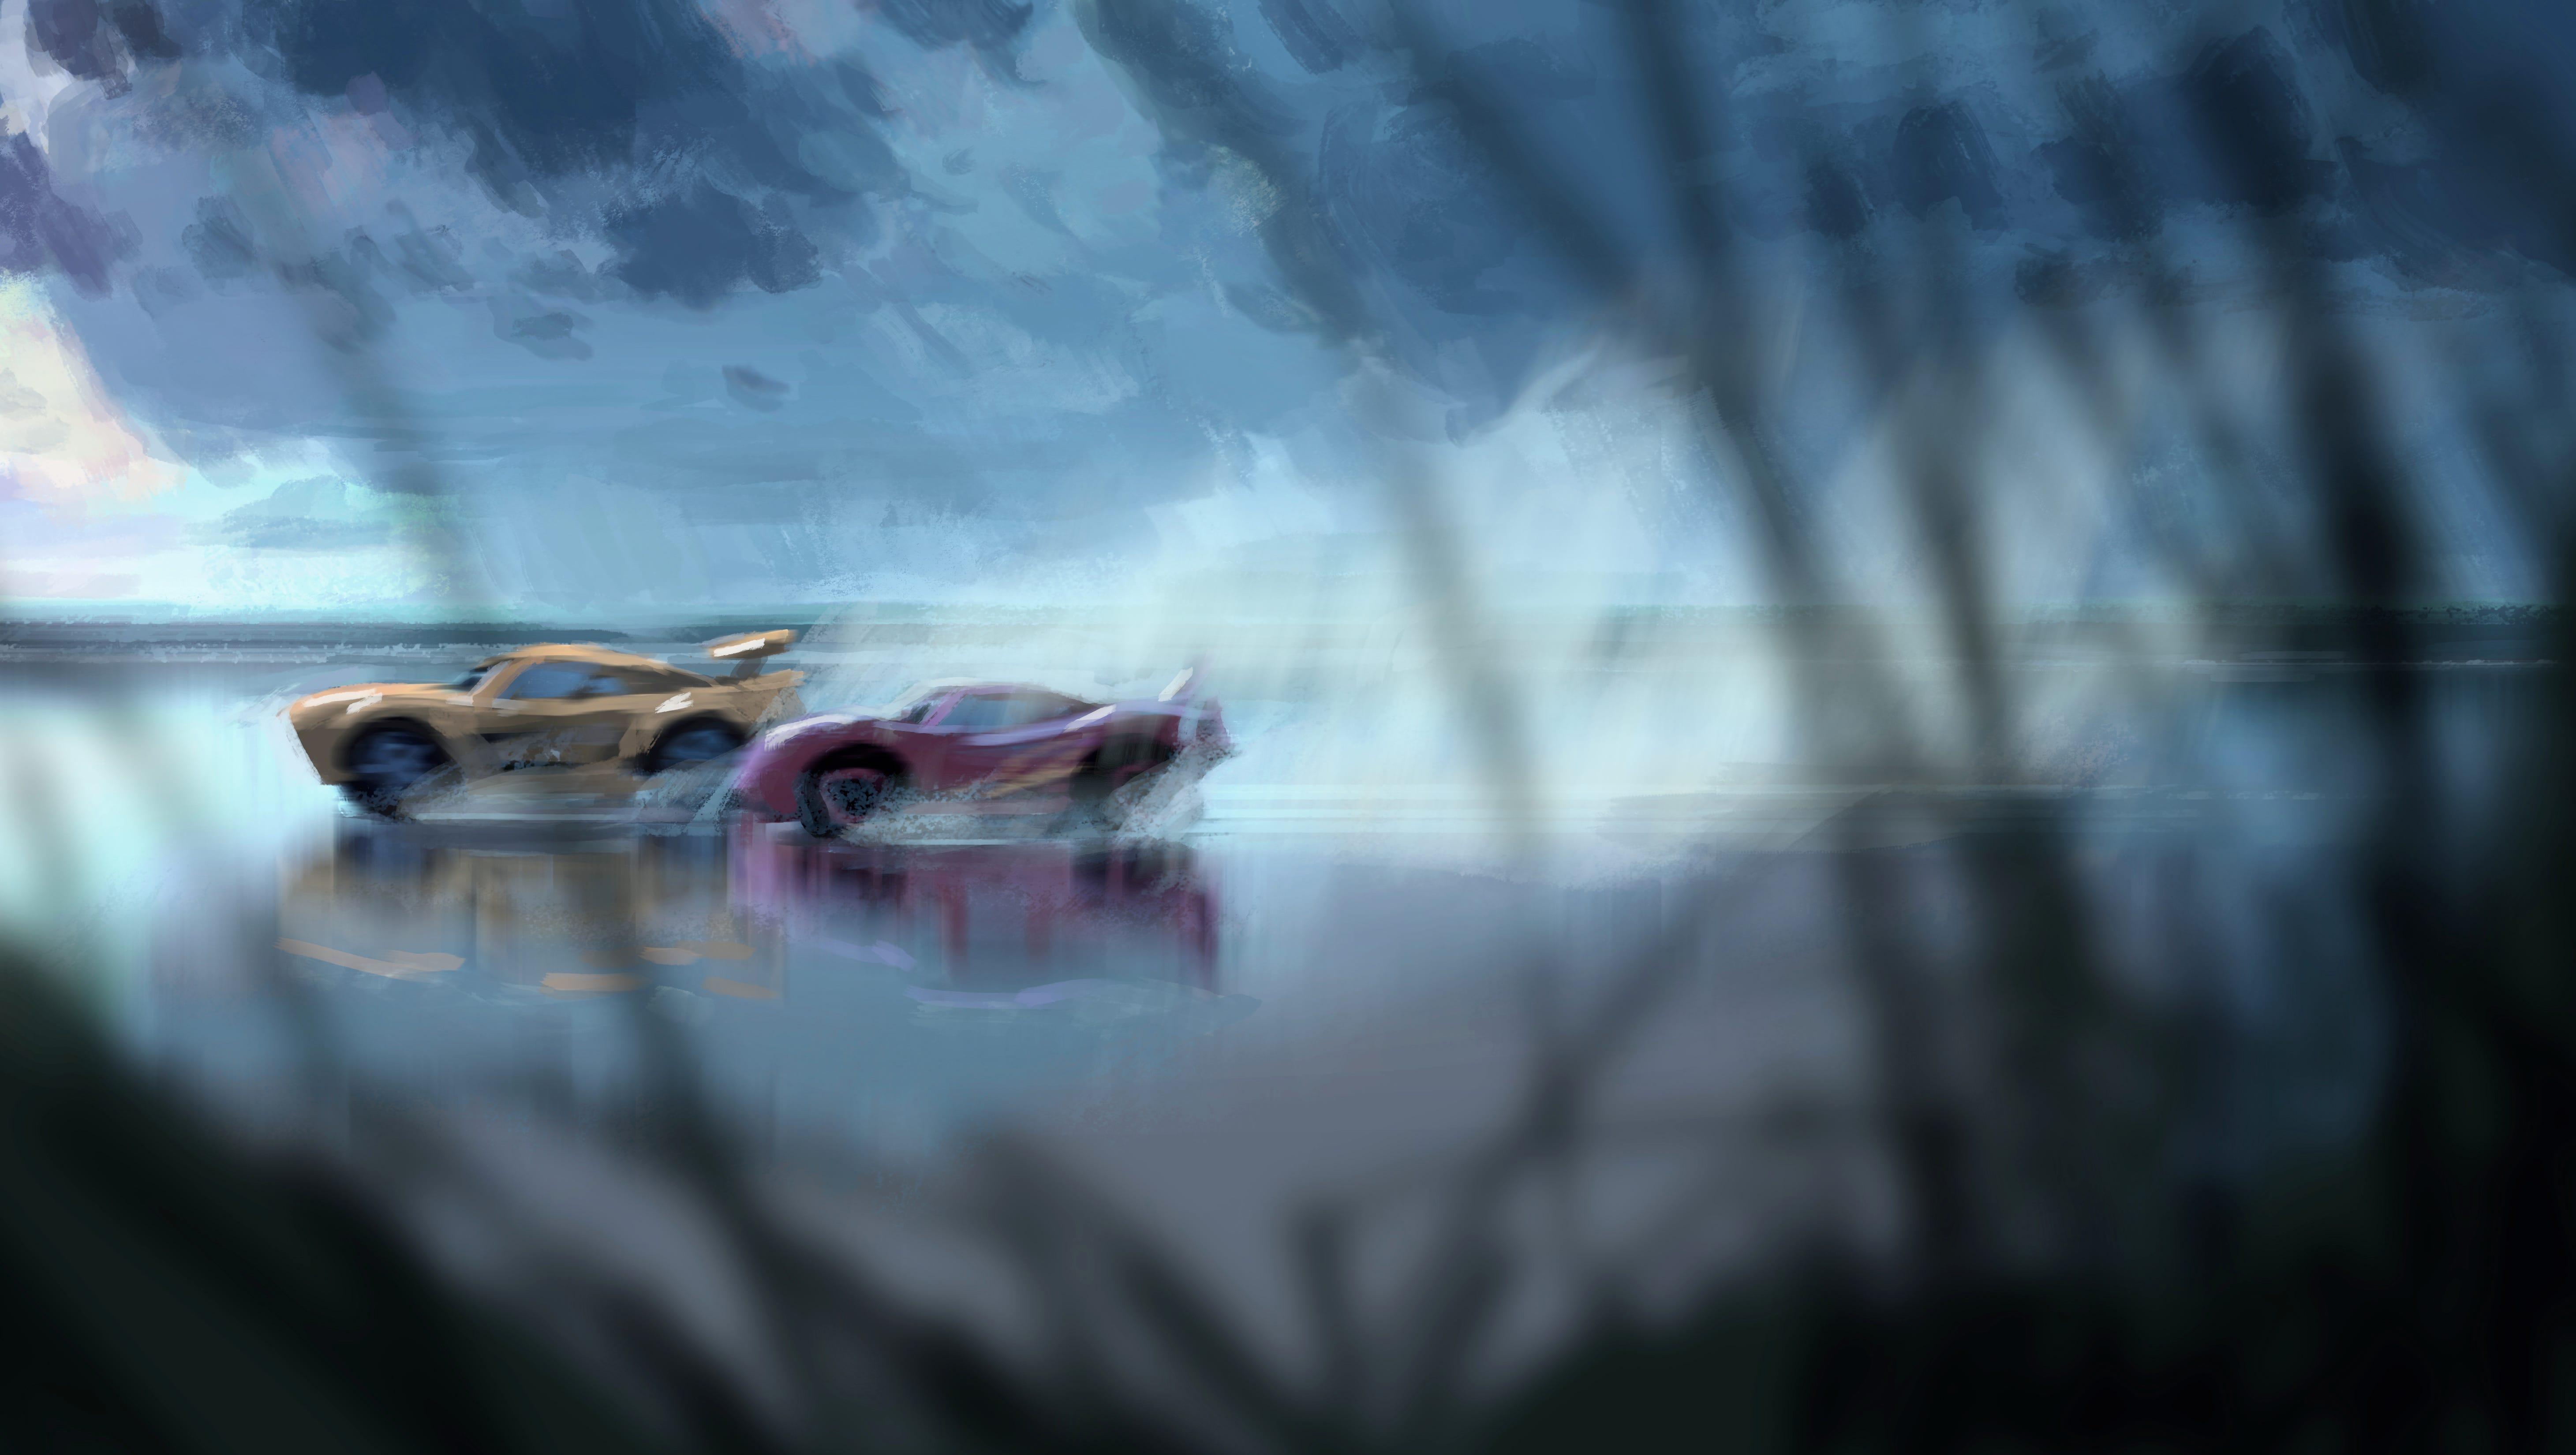 Sneak Peek Cars 3 Zooms Ahead With New Character Cruz Ramirez